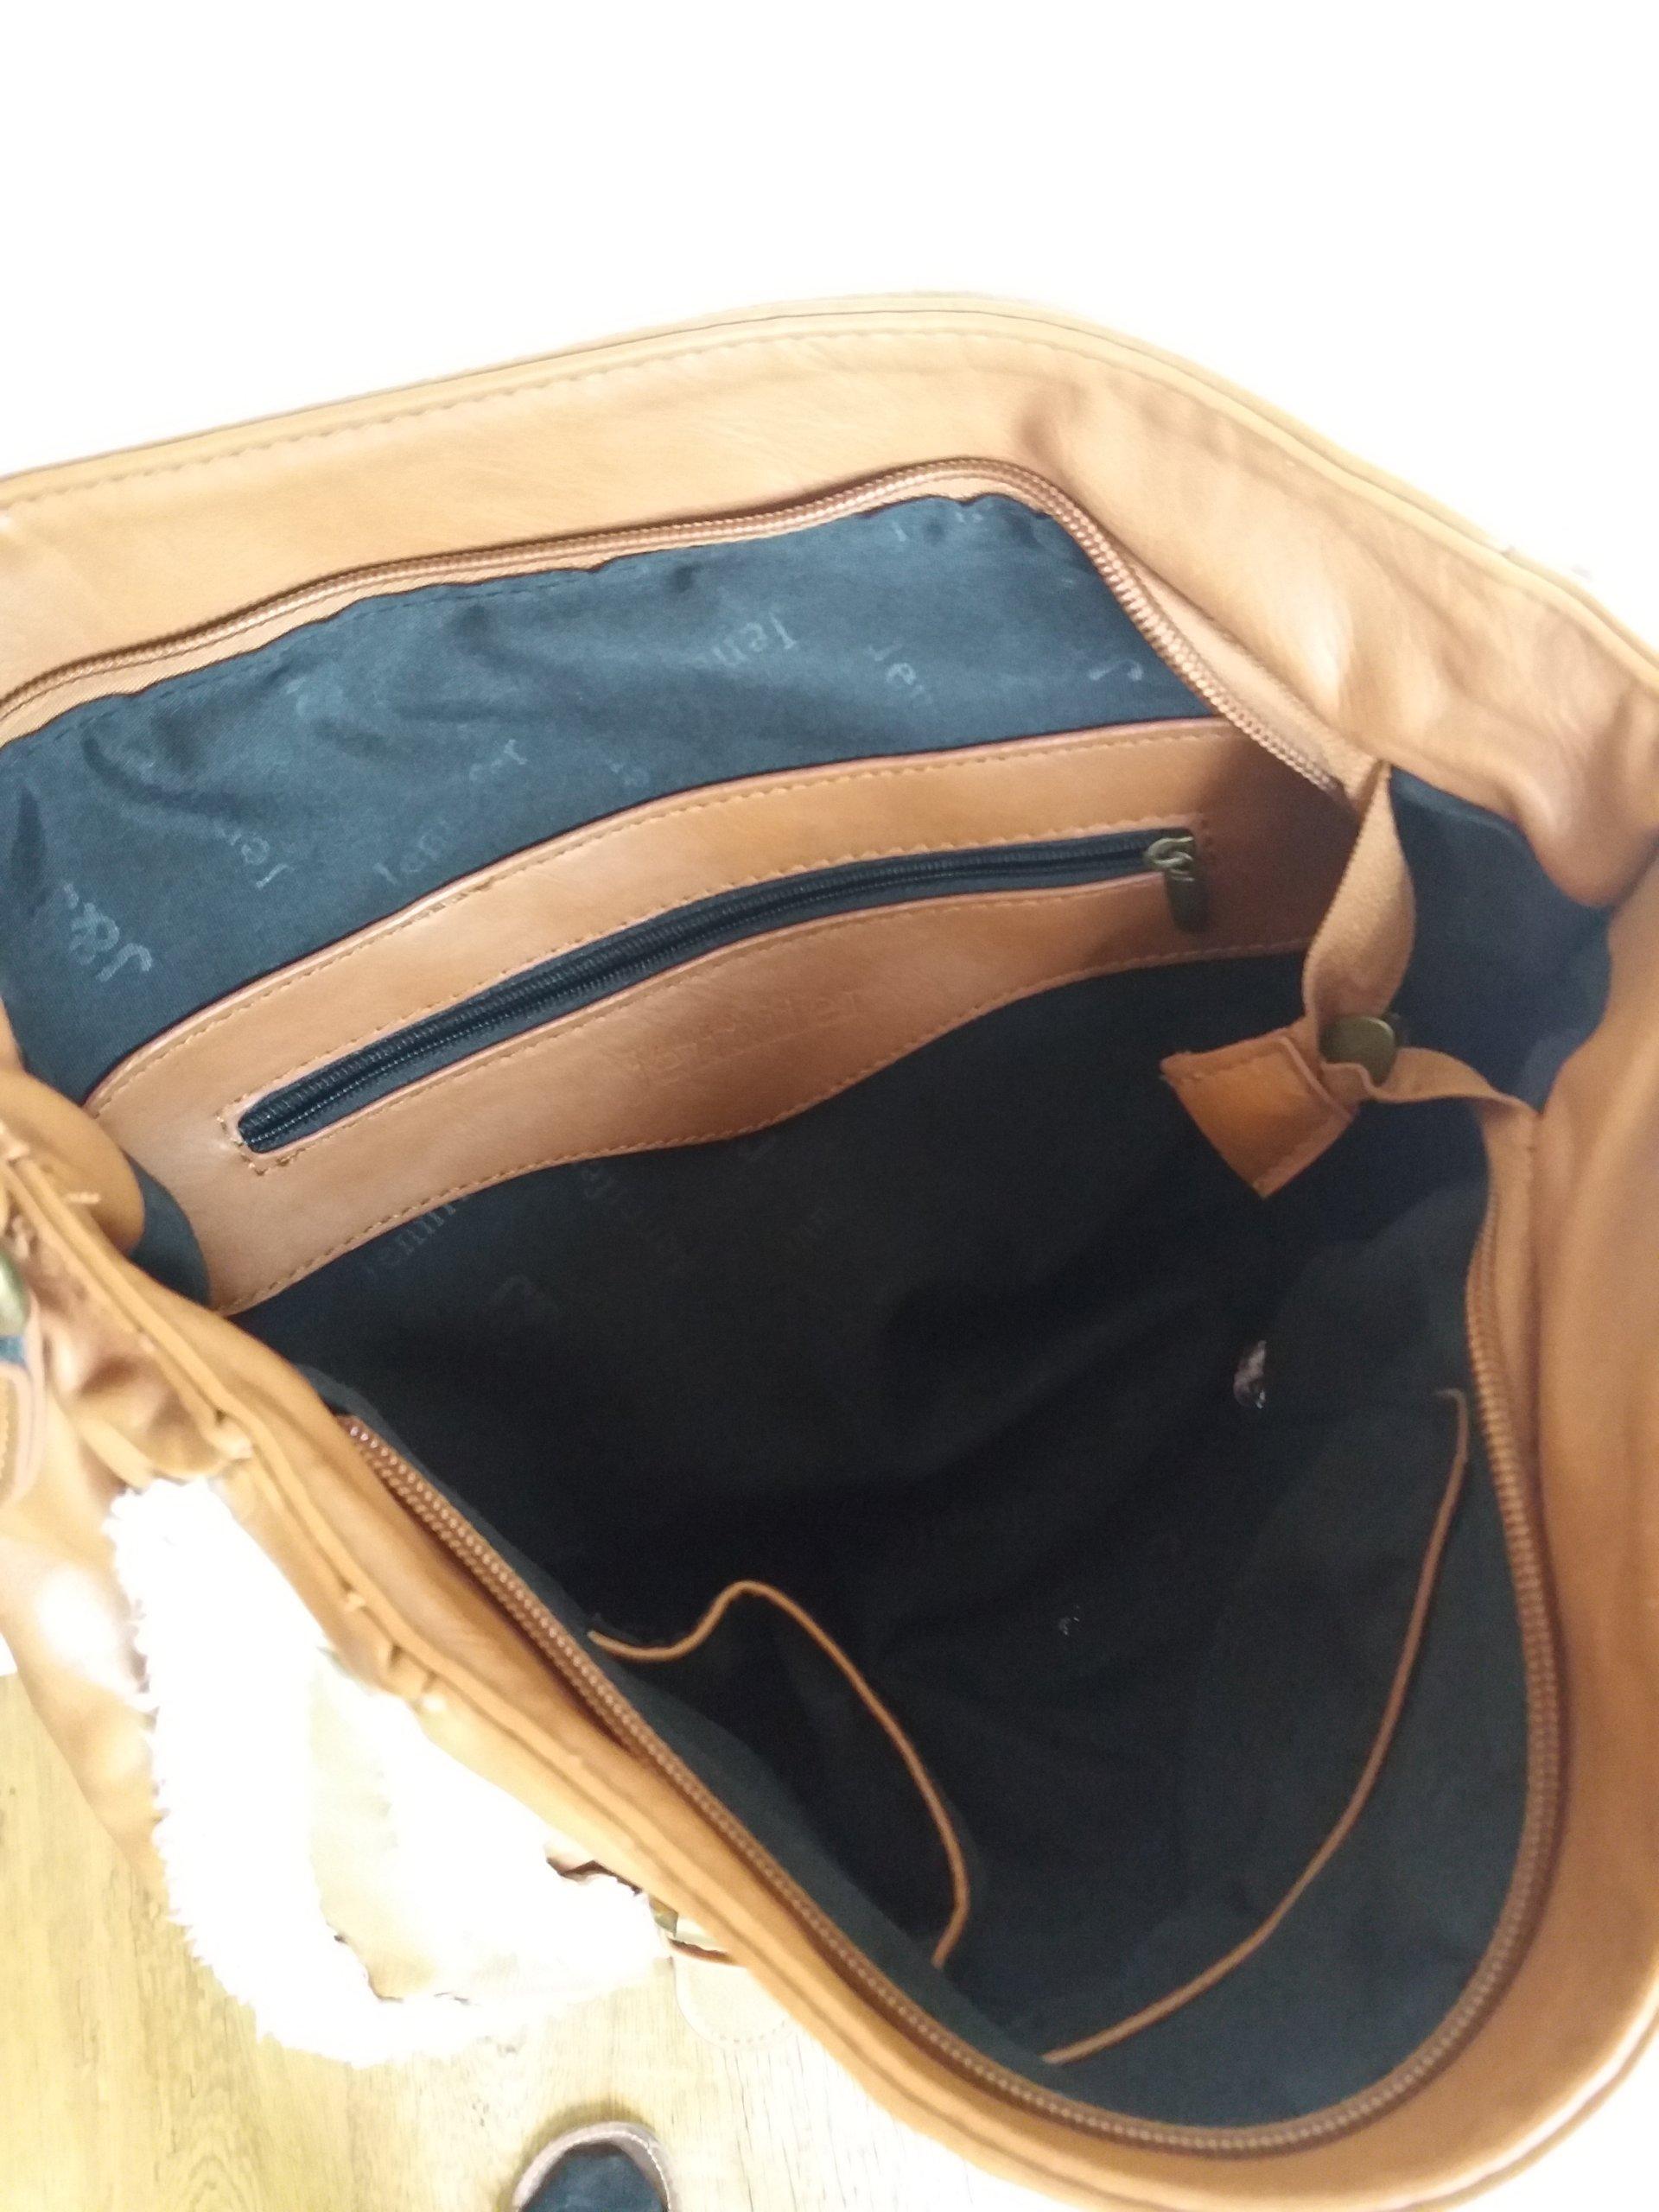 776be064ab1e9 Torebka skórzana skóra Jennifer CCC - 7256745653 - oficjalne ...